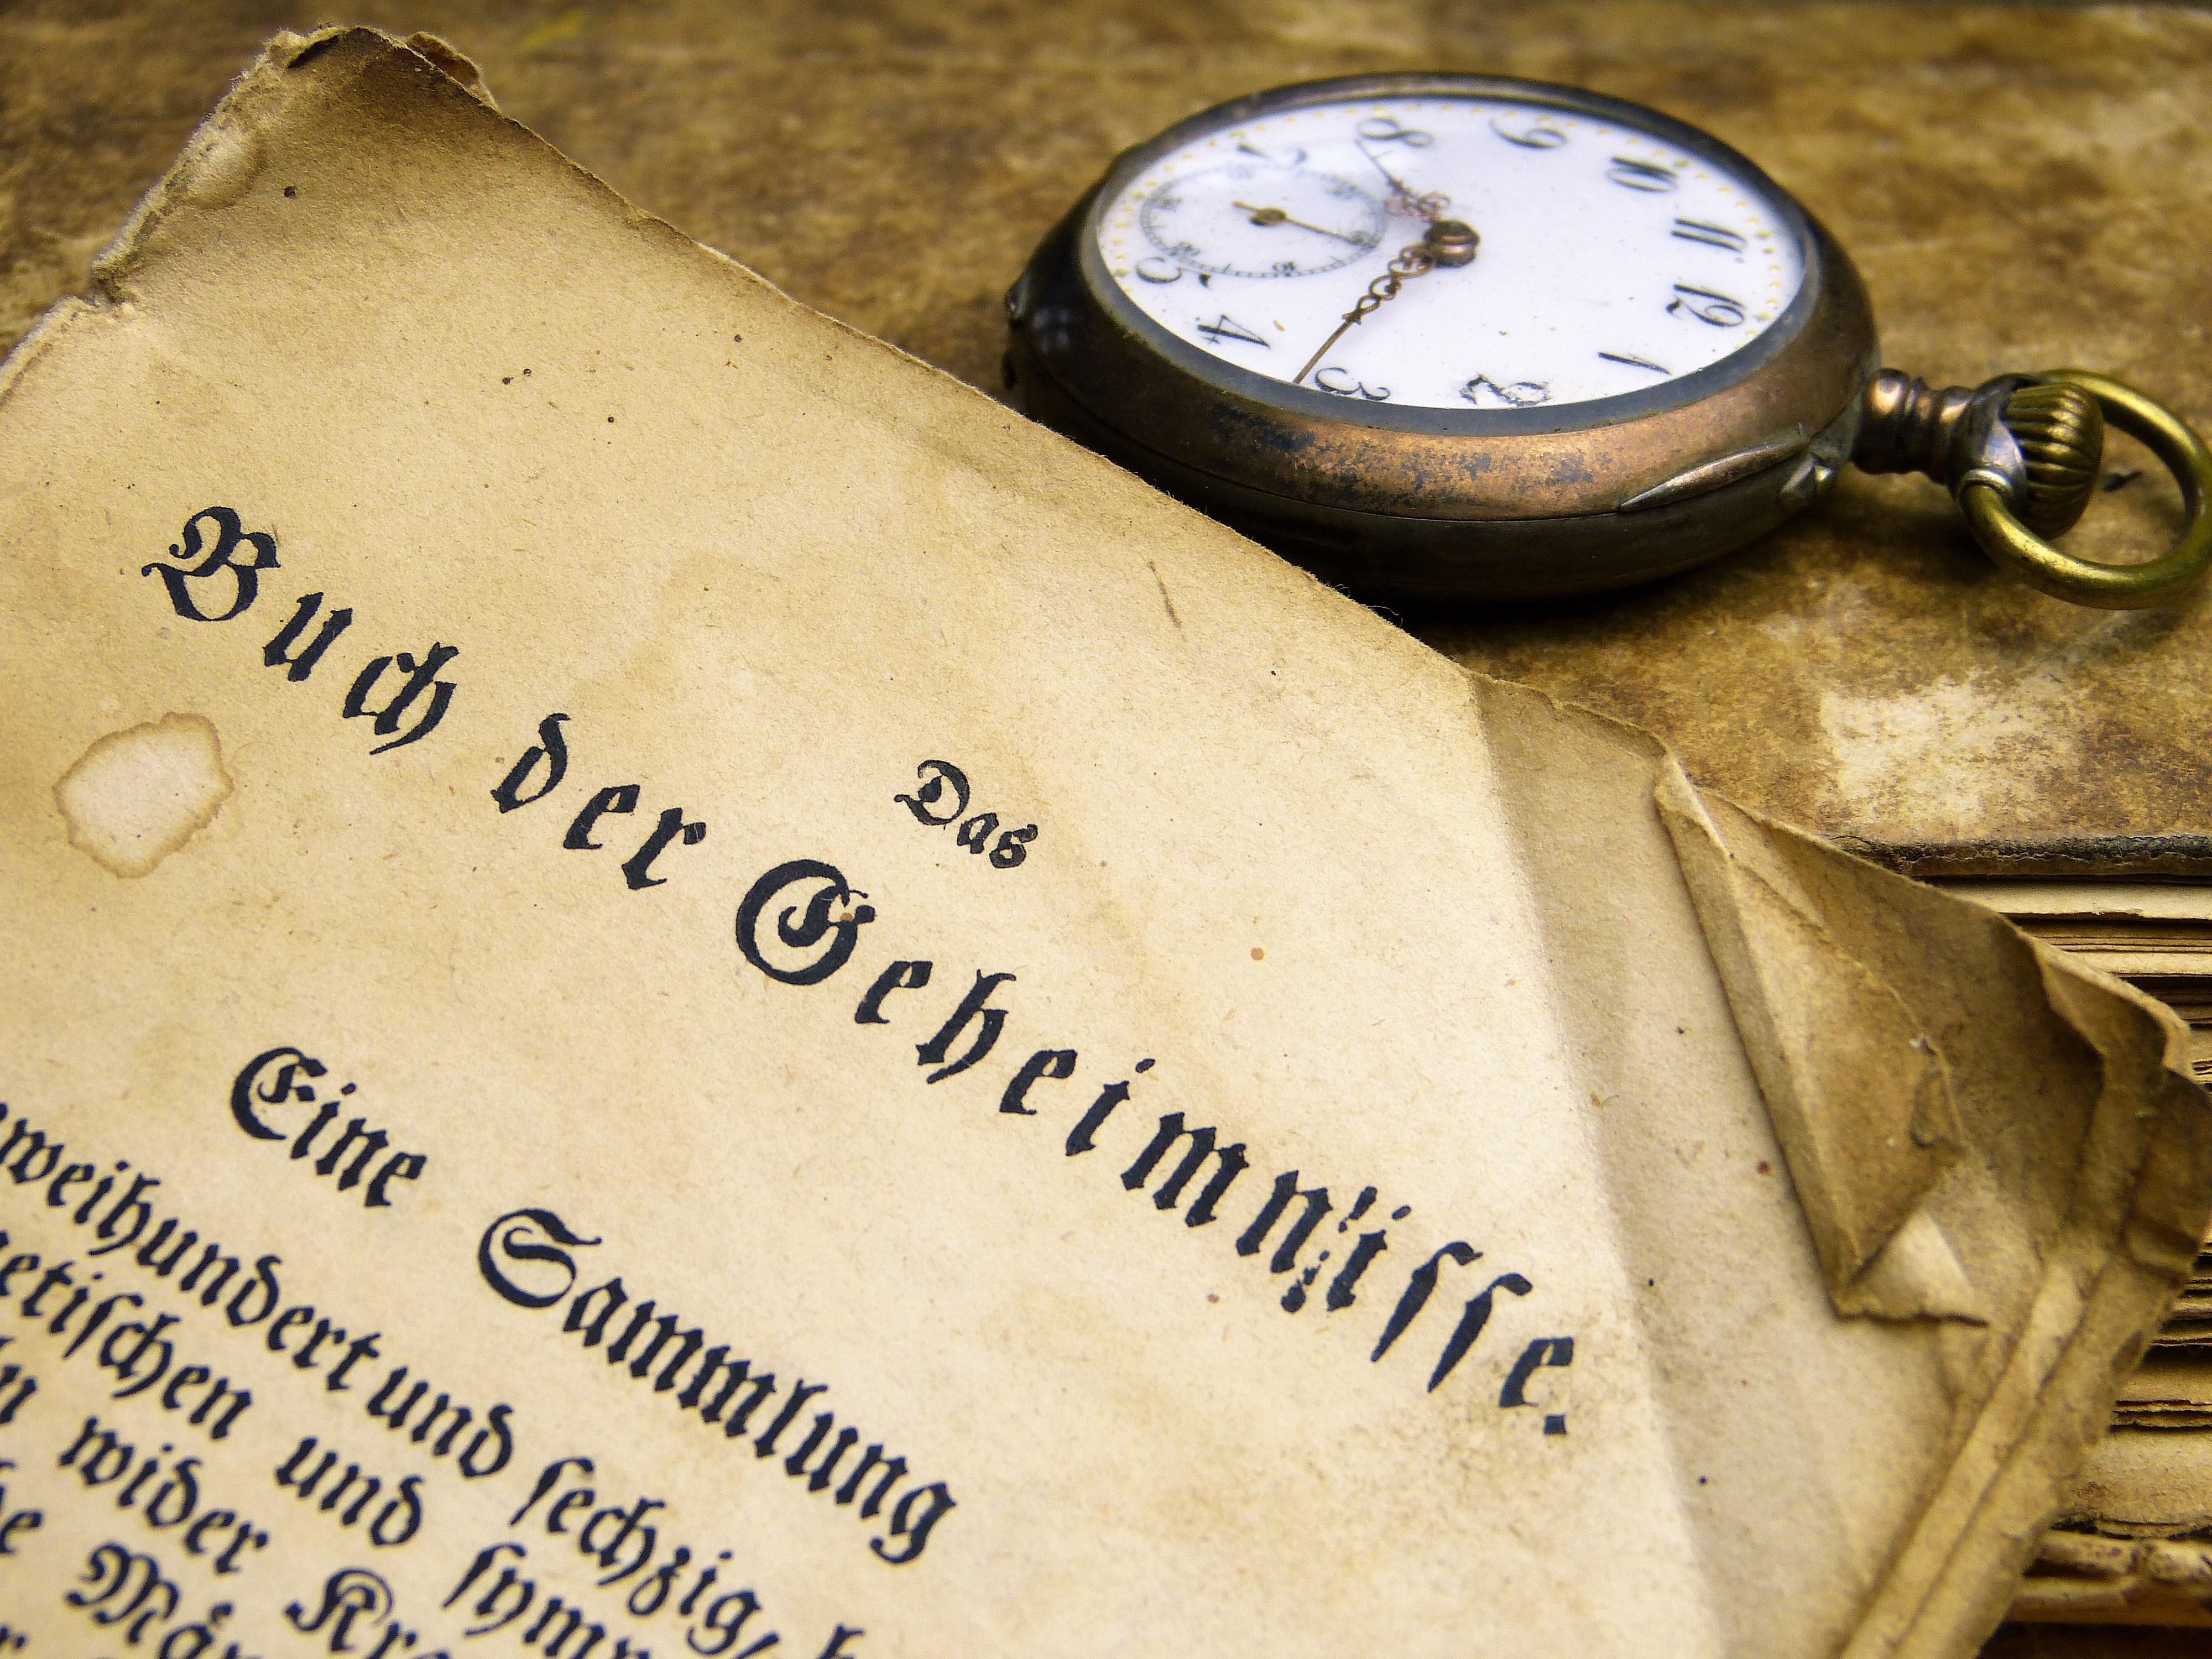 Brass-colored Pocket Watch Beside Book